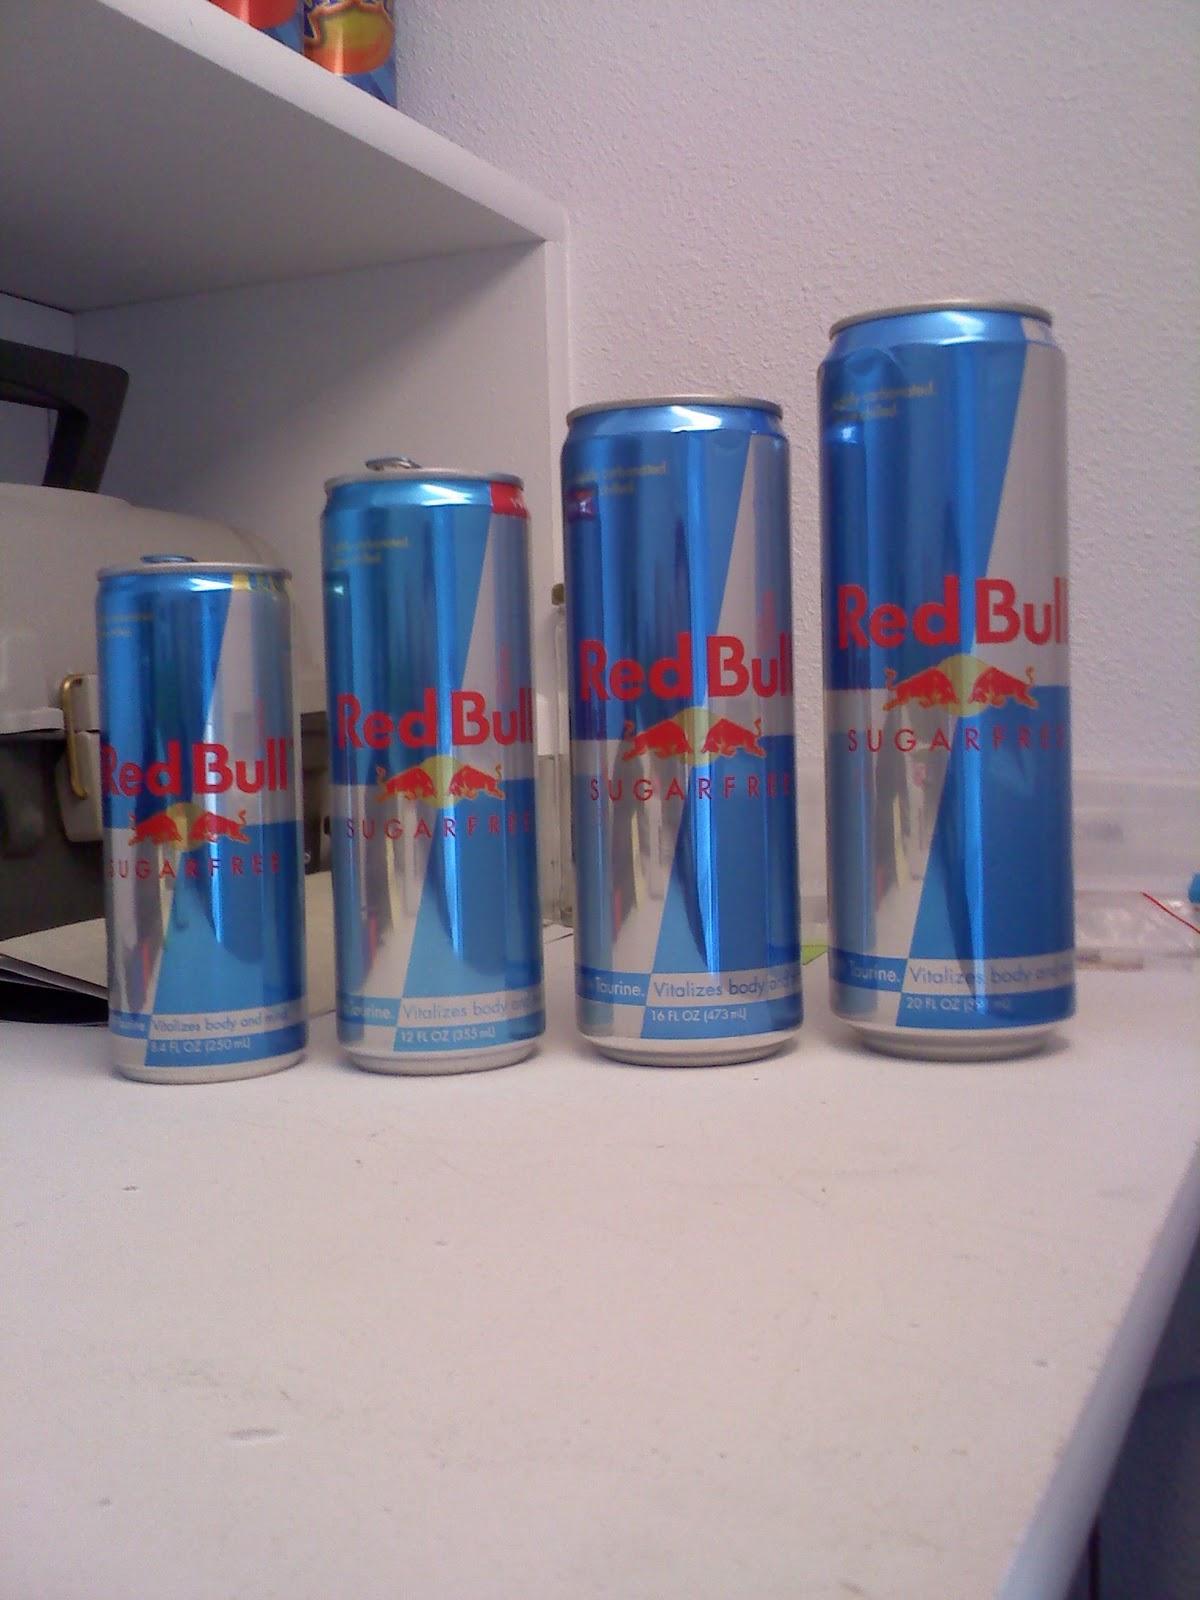 caffeine in sugar free red bull